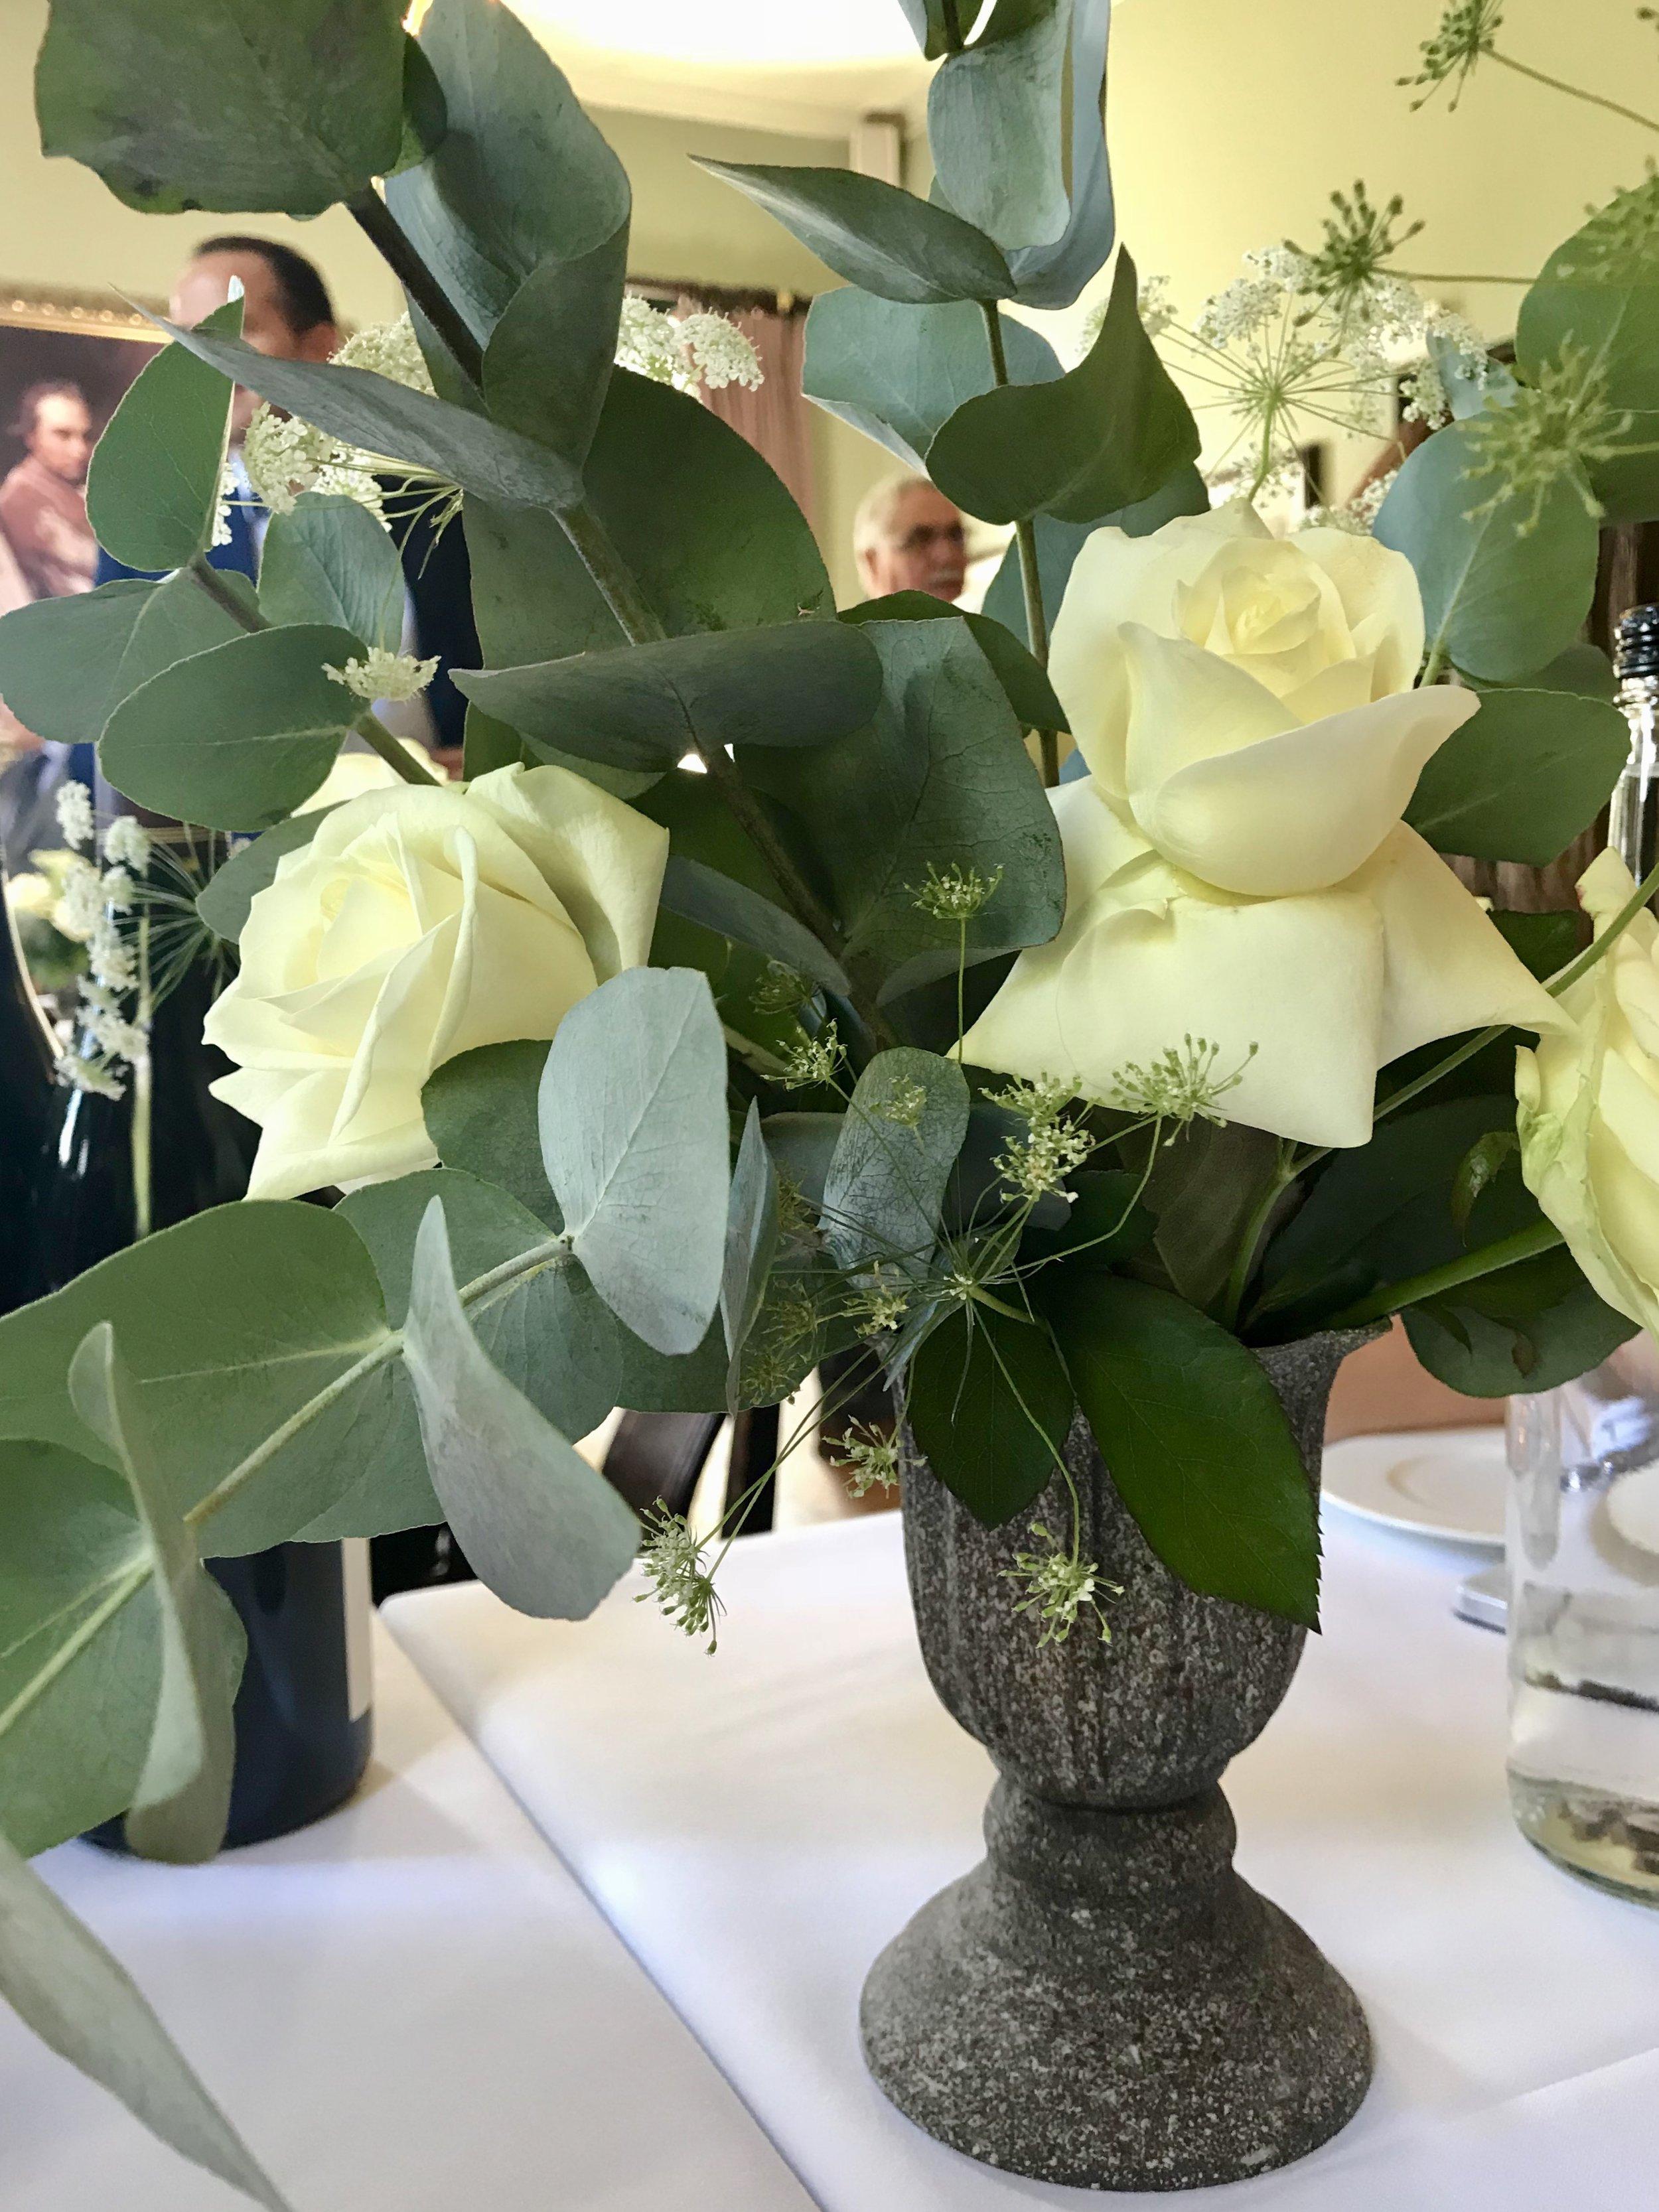 a wedding - flower details